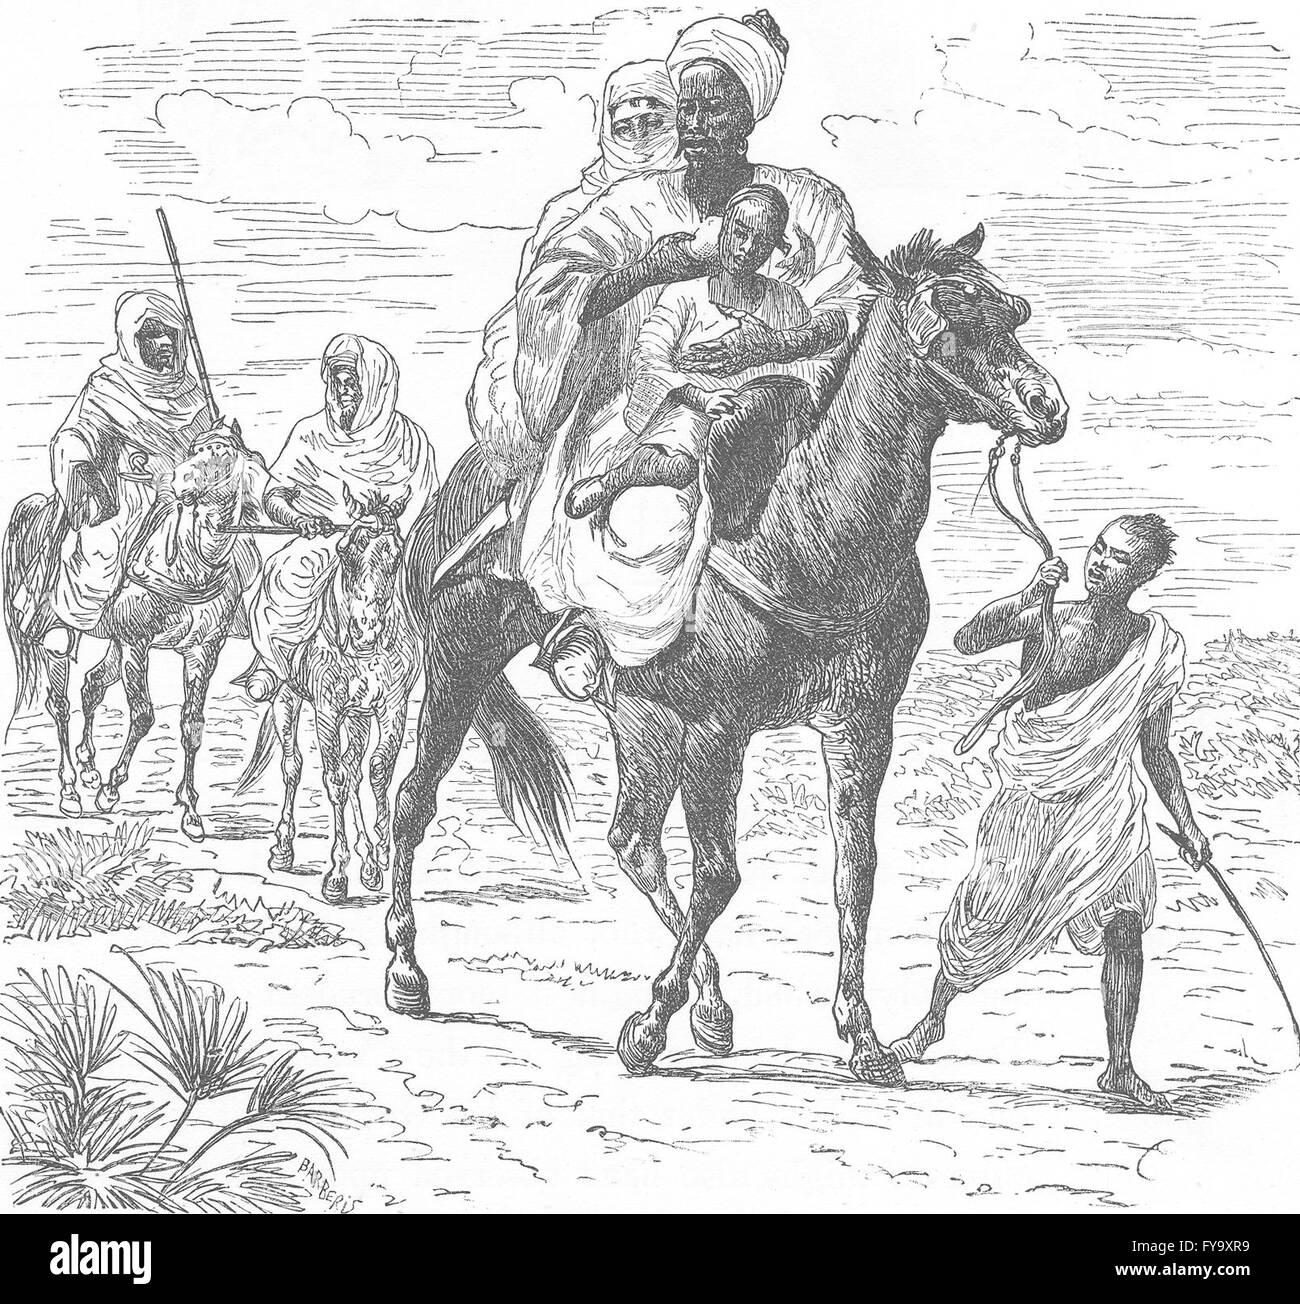 MOROCCO: Merchants of Meknes, antique print 1882 - Stock Image